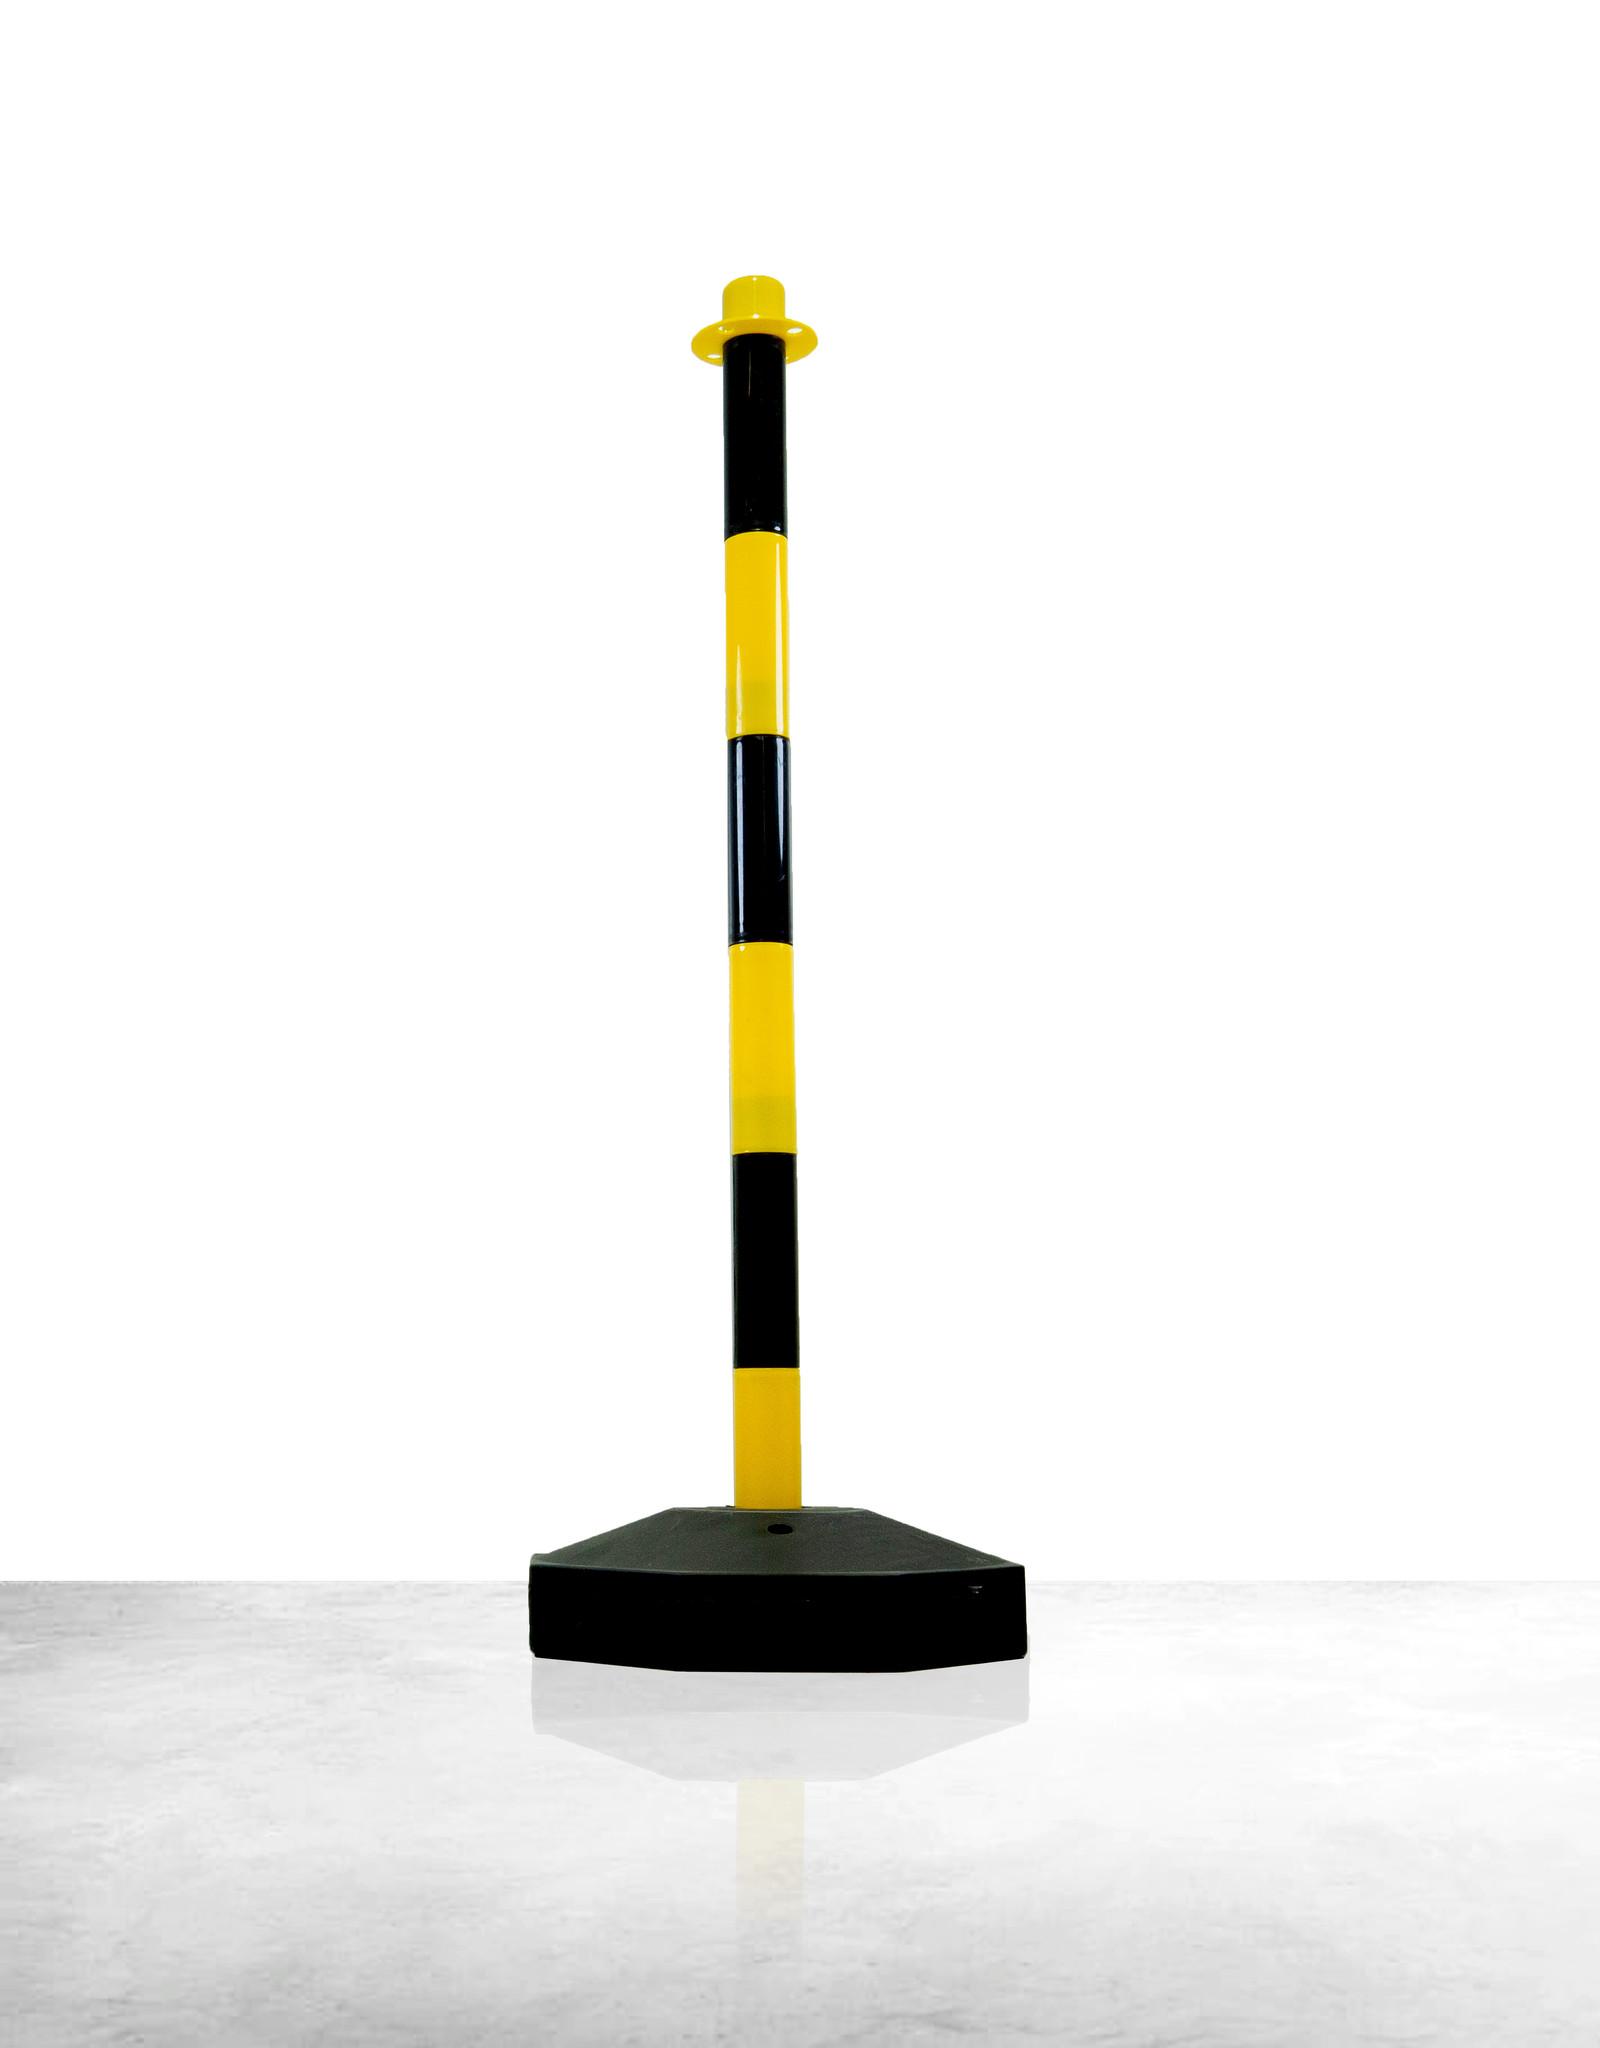 Ri-Traffic | Kettingpalen Set 6 stuks, 12 stuks & 24 stuks (geel-zwart)